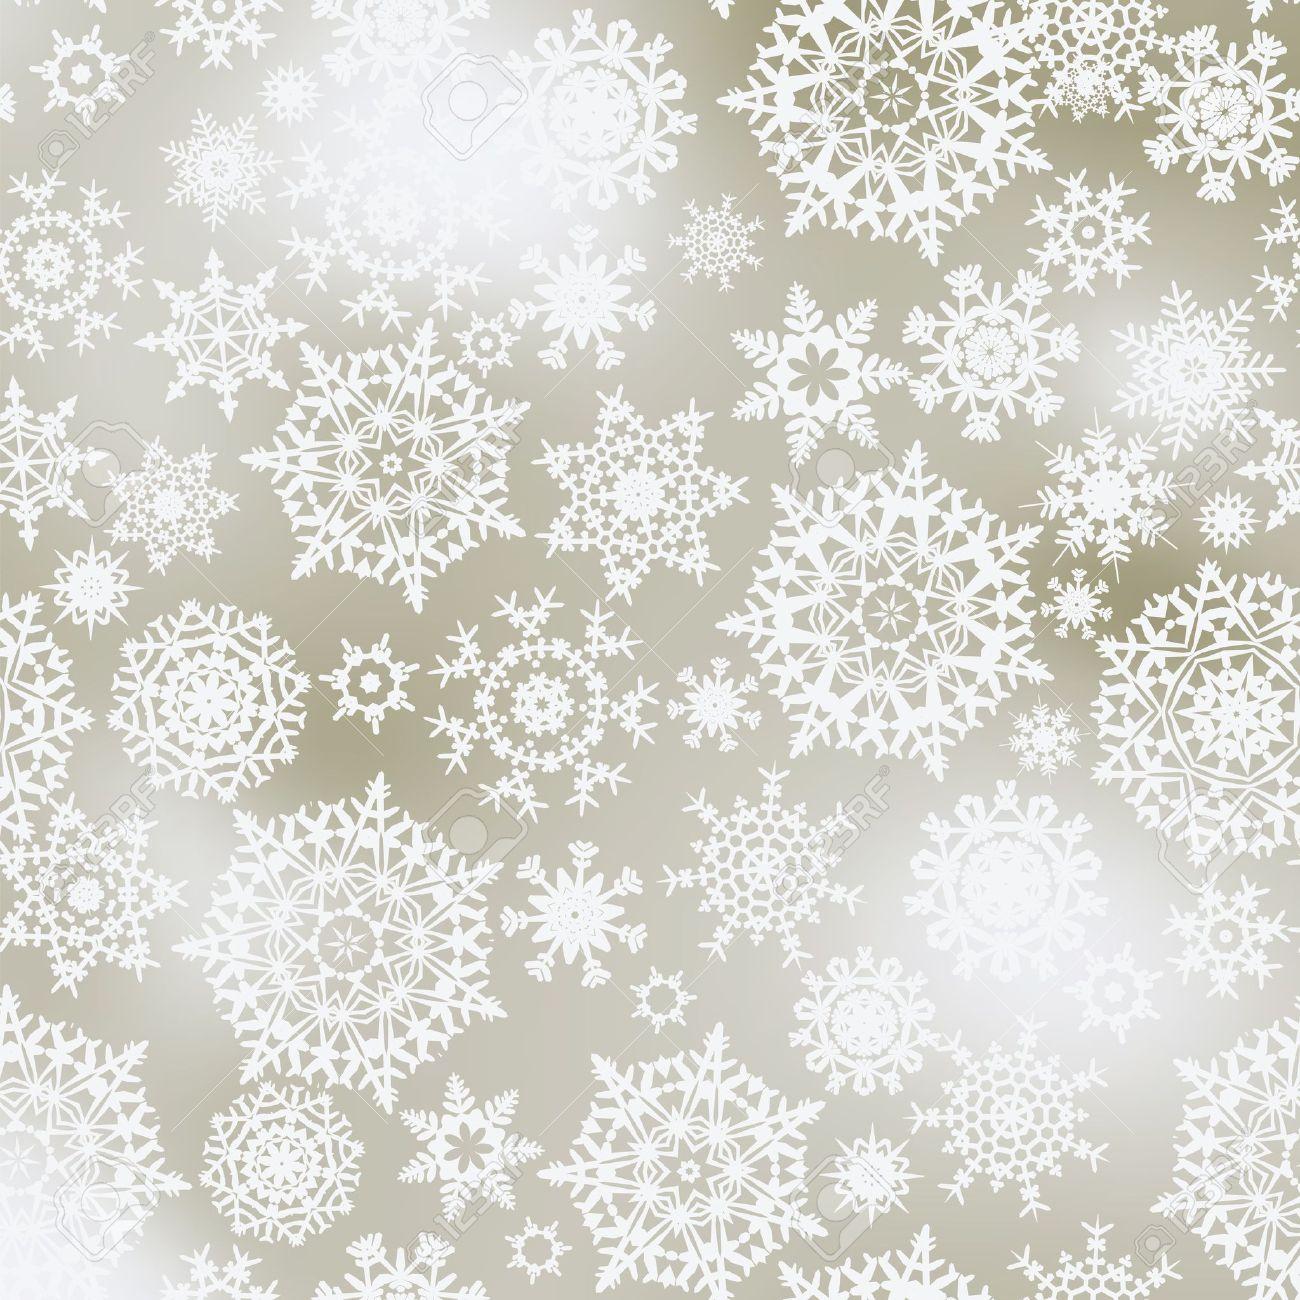 Elegant Christmas Background Hd.Light Elegant Christmas Background With White Snowflakes